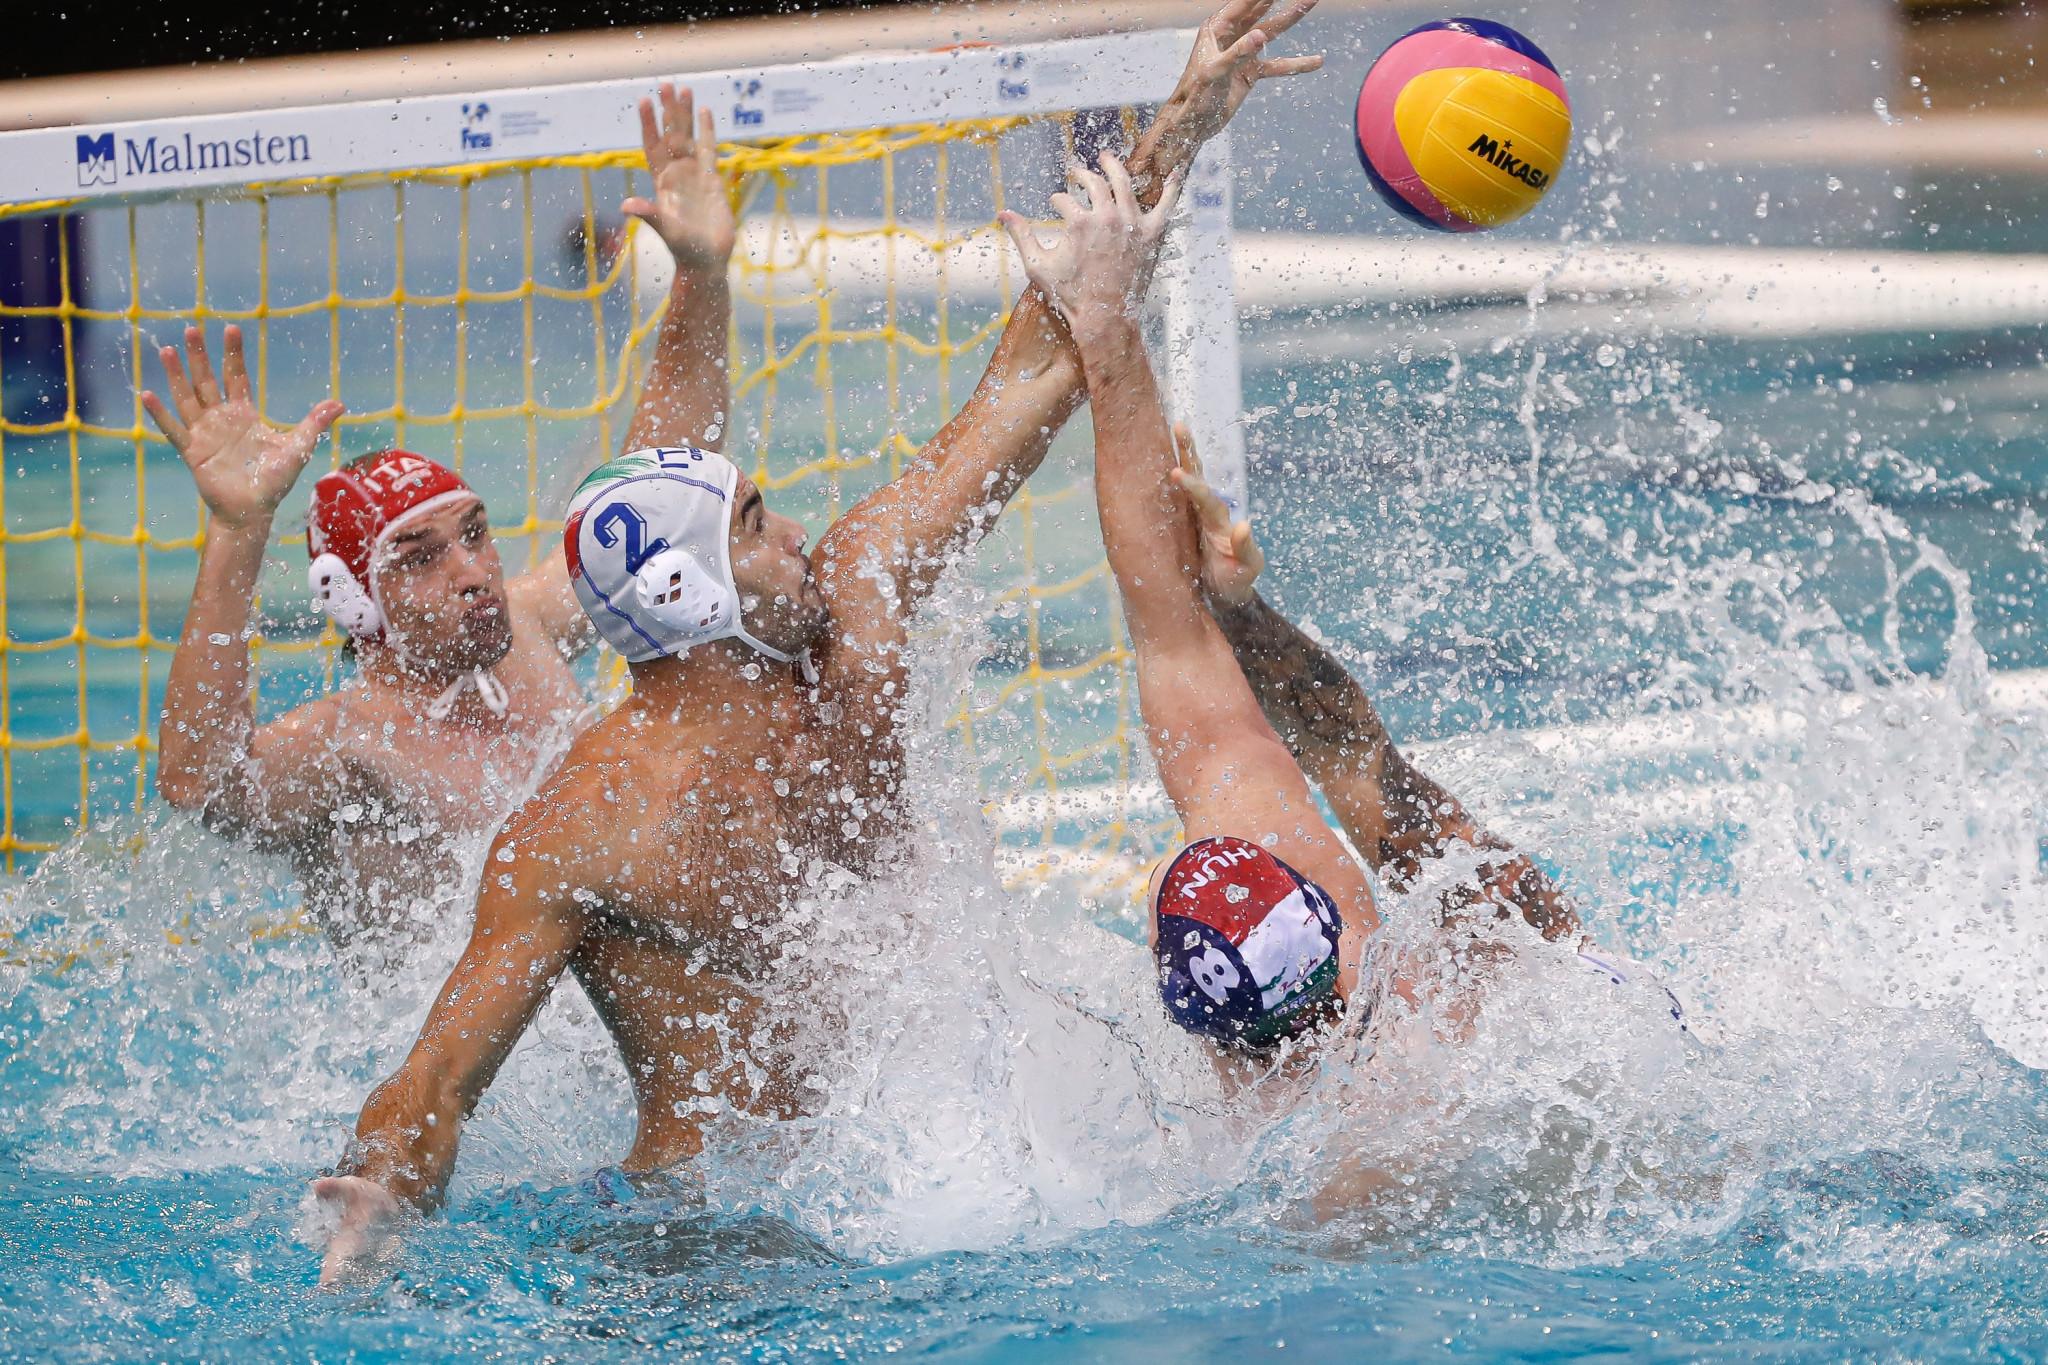 Italy beat Hungary 8-7 in the day's final FINA Men's Water Polo World League quarter-final ©FINA